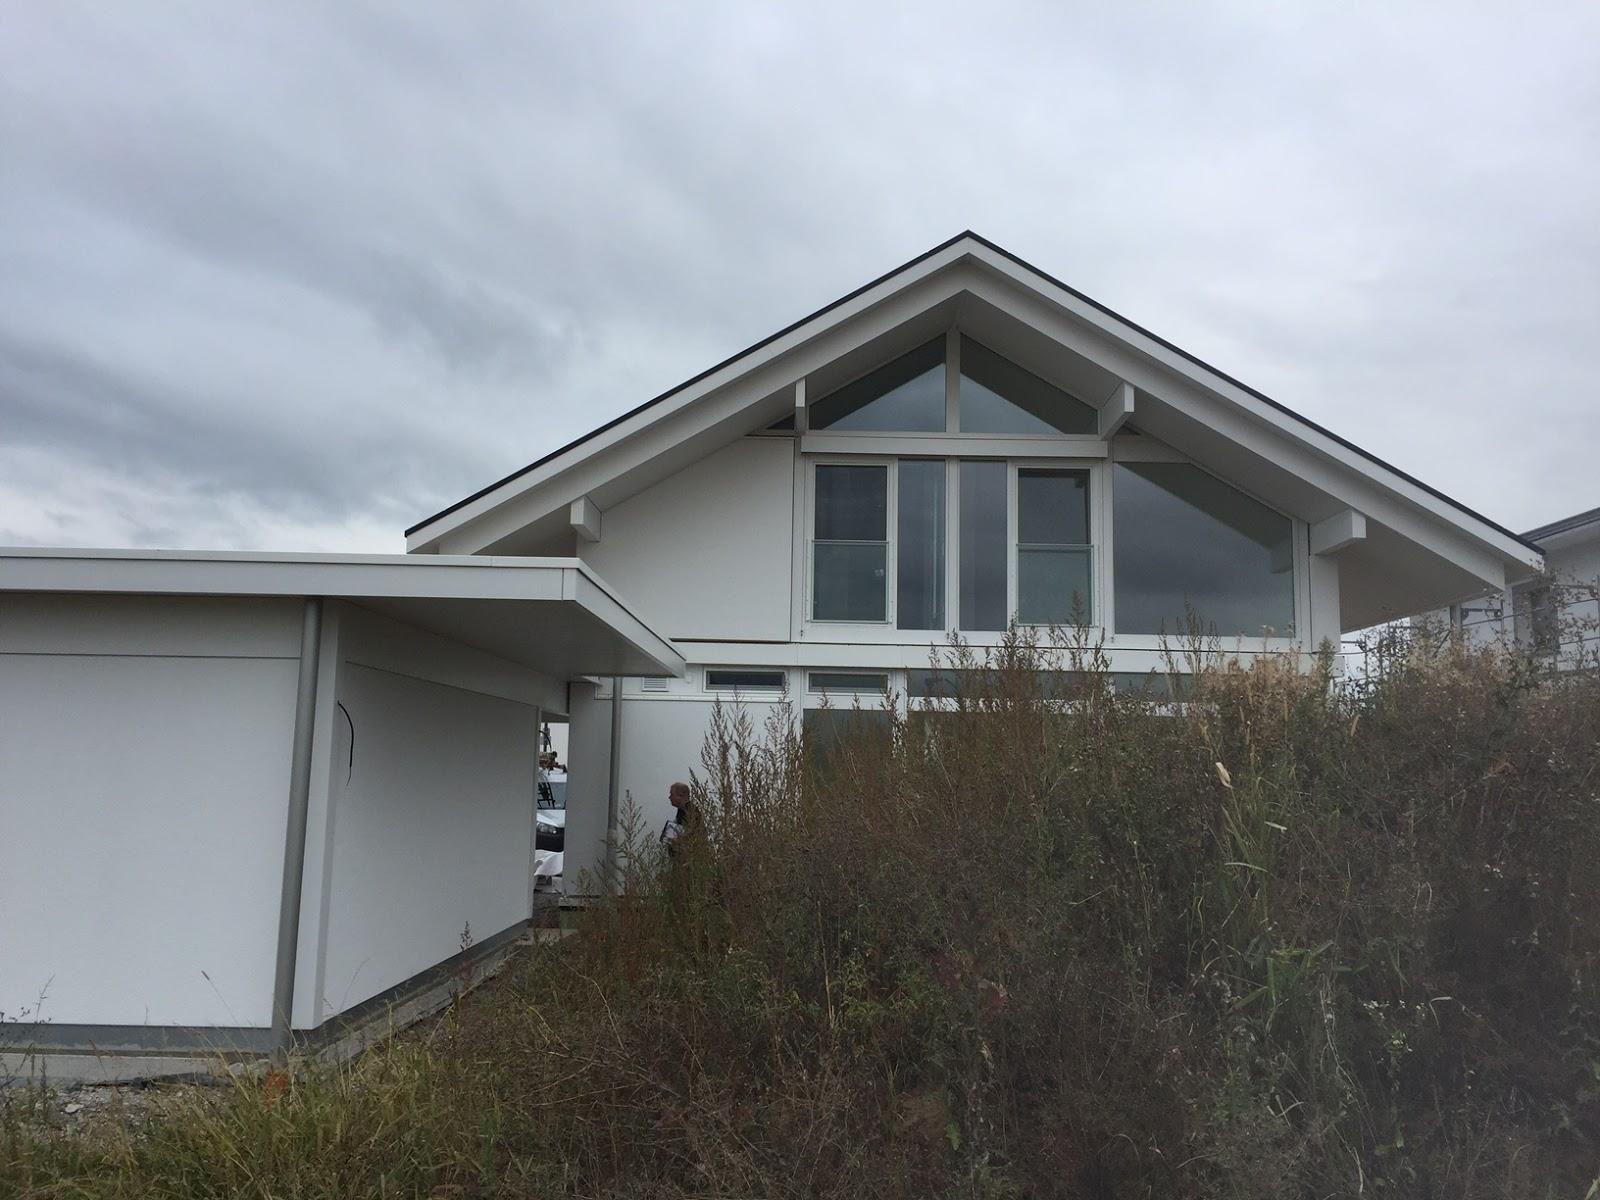 Hausabnahme, modum Haus, Huf | Modernes Fachwerkhaus - Alle ...